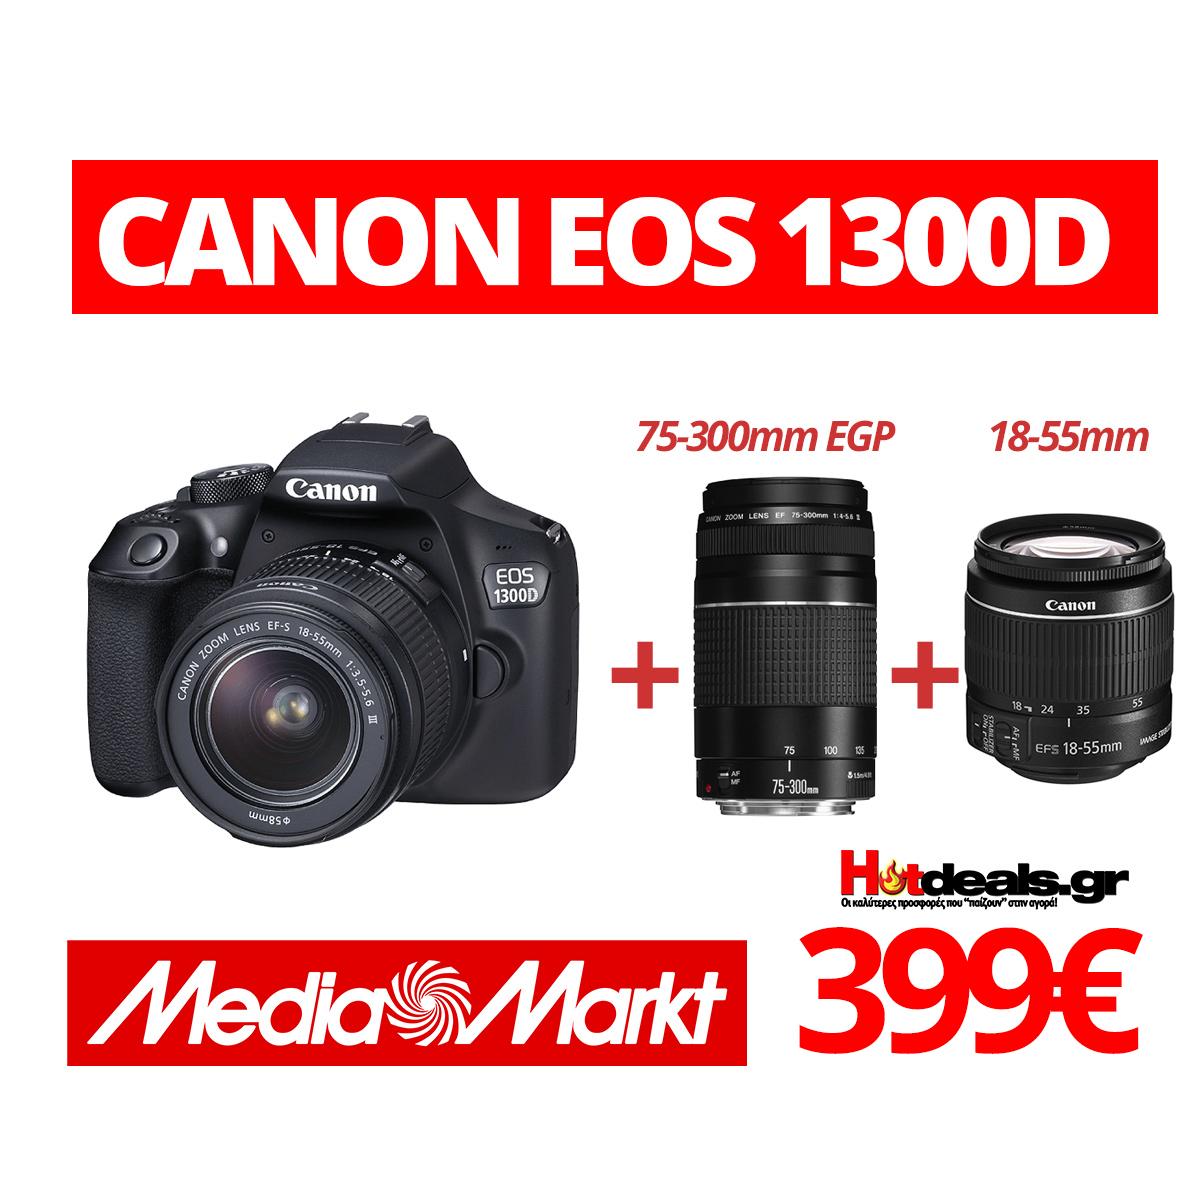 CANON-EOS-1300D_18-55mm_75-300mm-EGP-prosfora-399e-mediamarkt